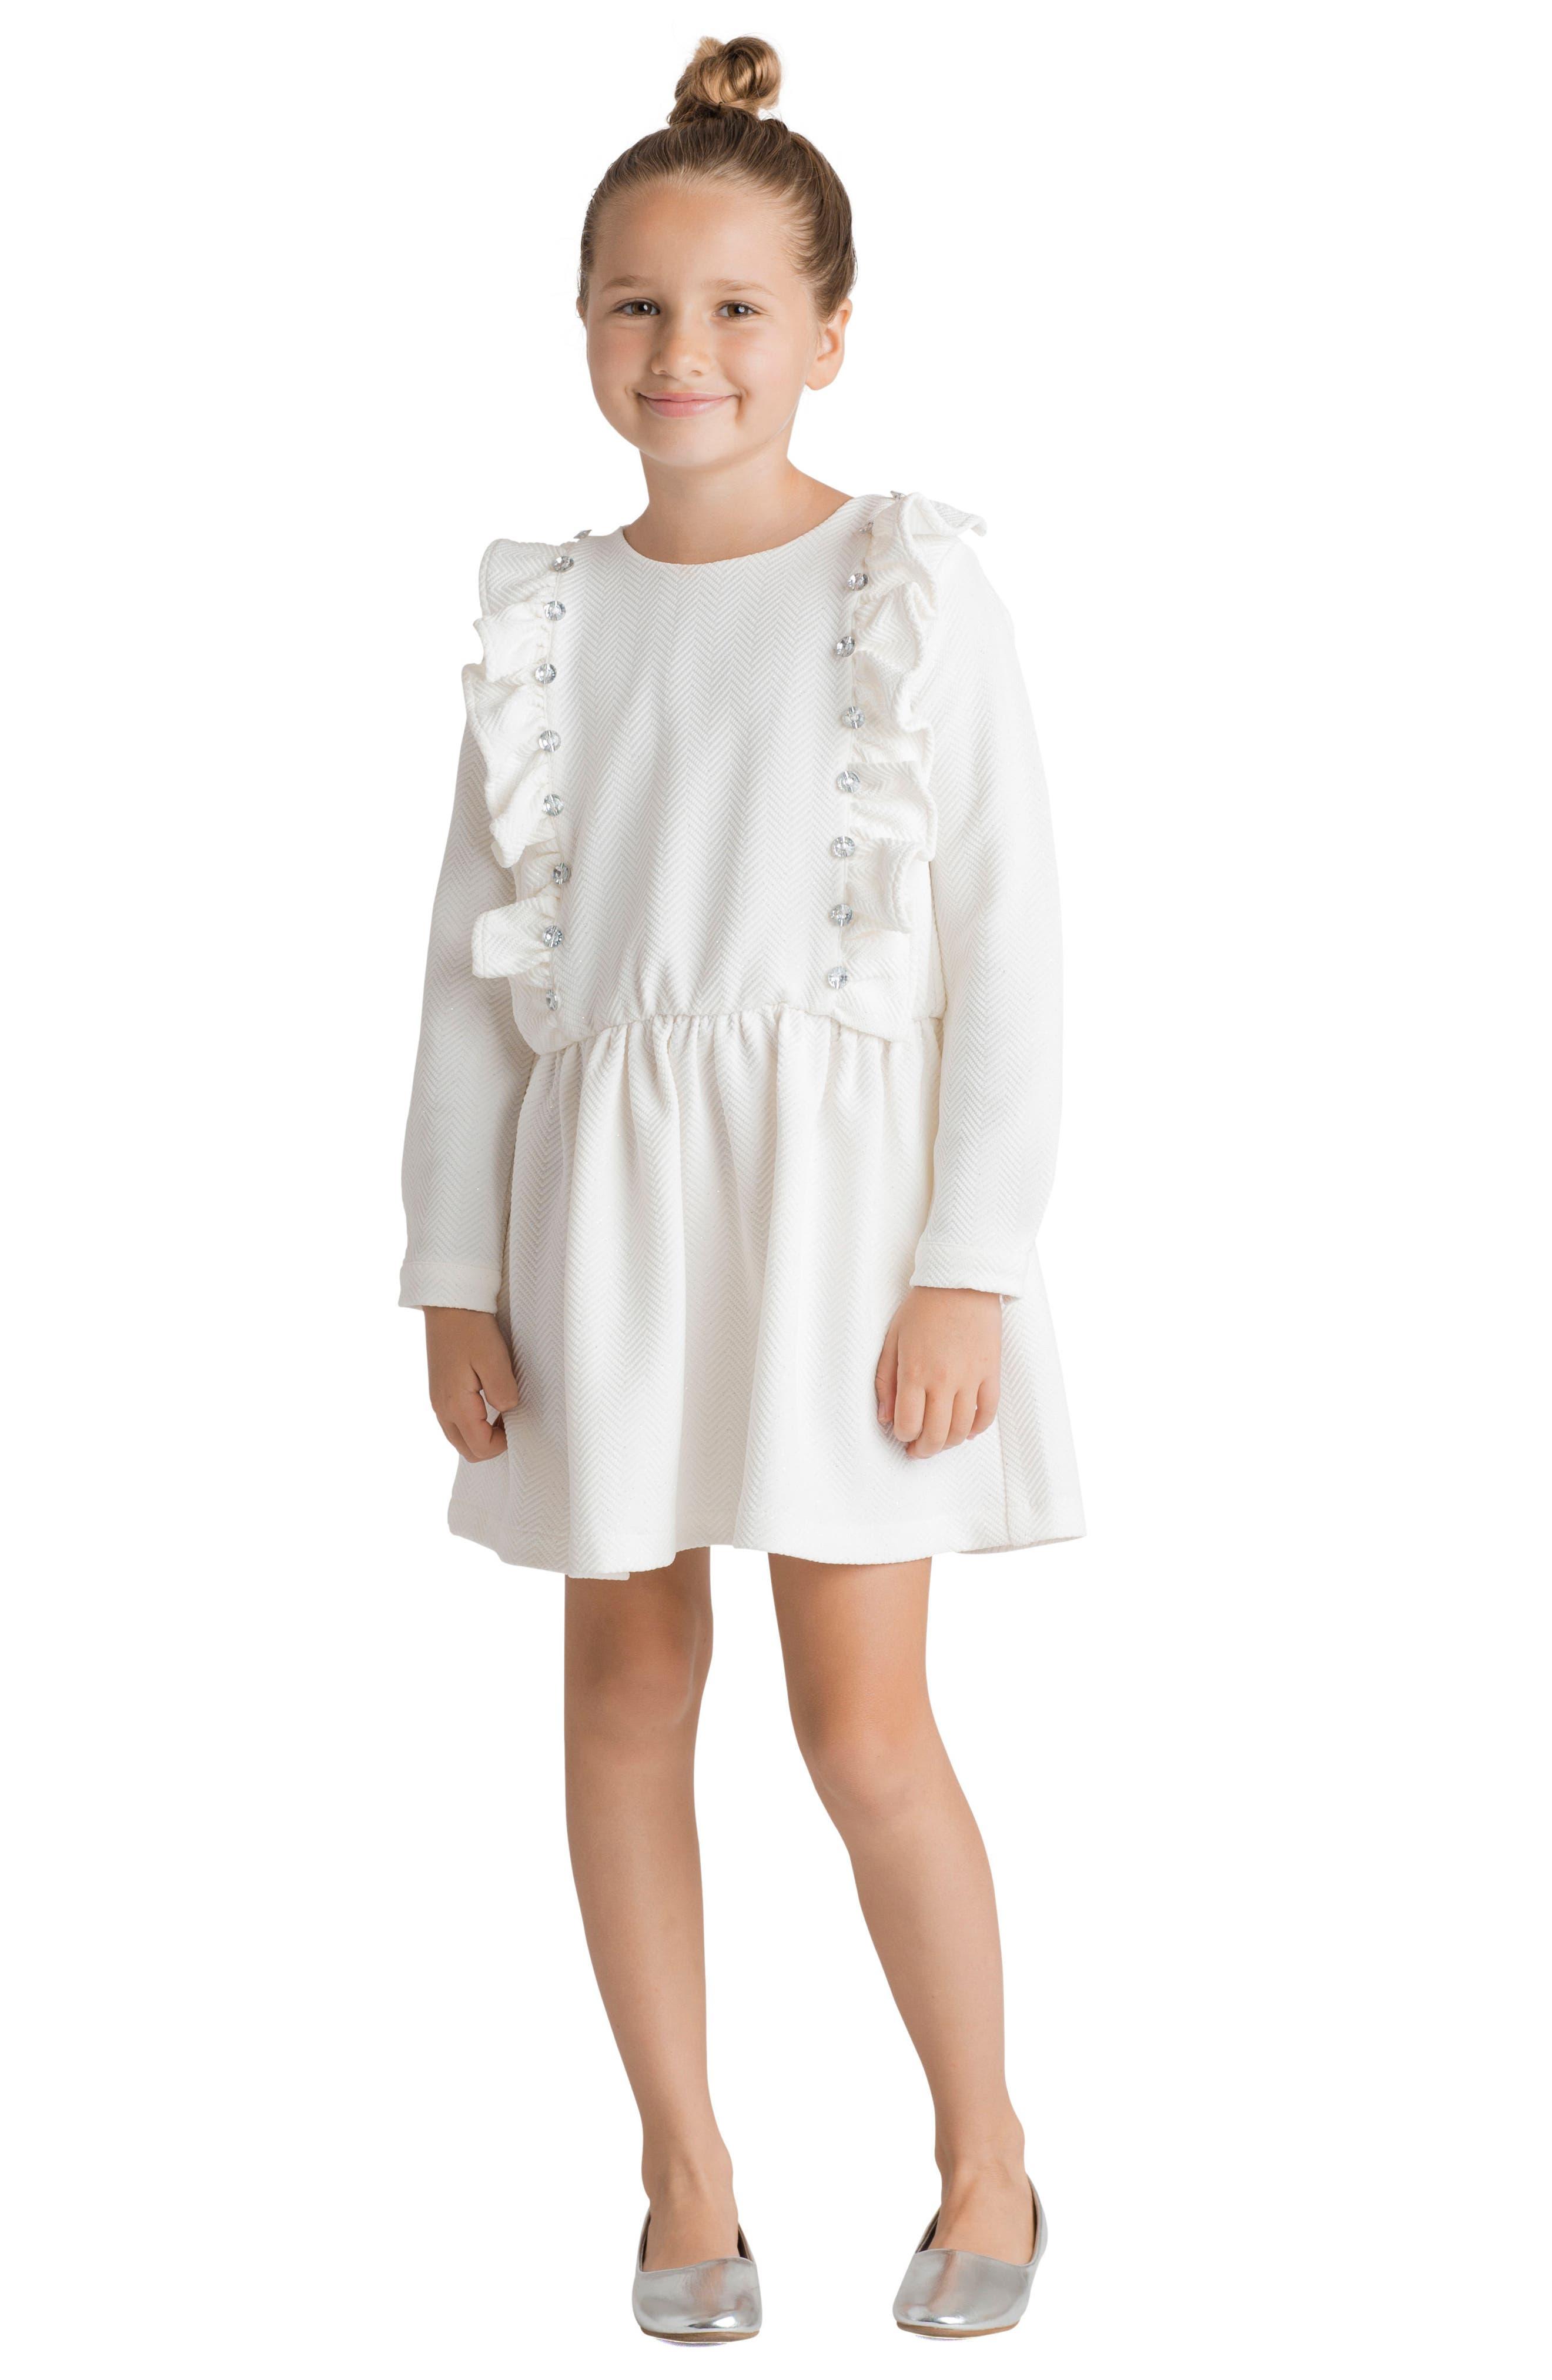 Fantasia Dress,                             Alternate thumbnail 5, color,                             901